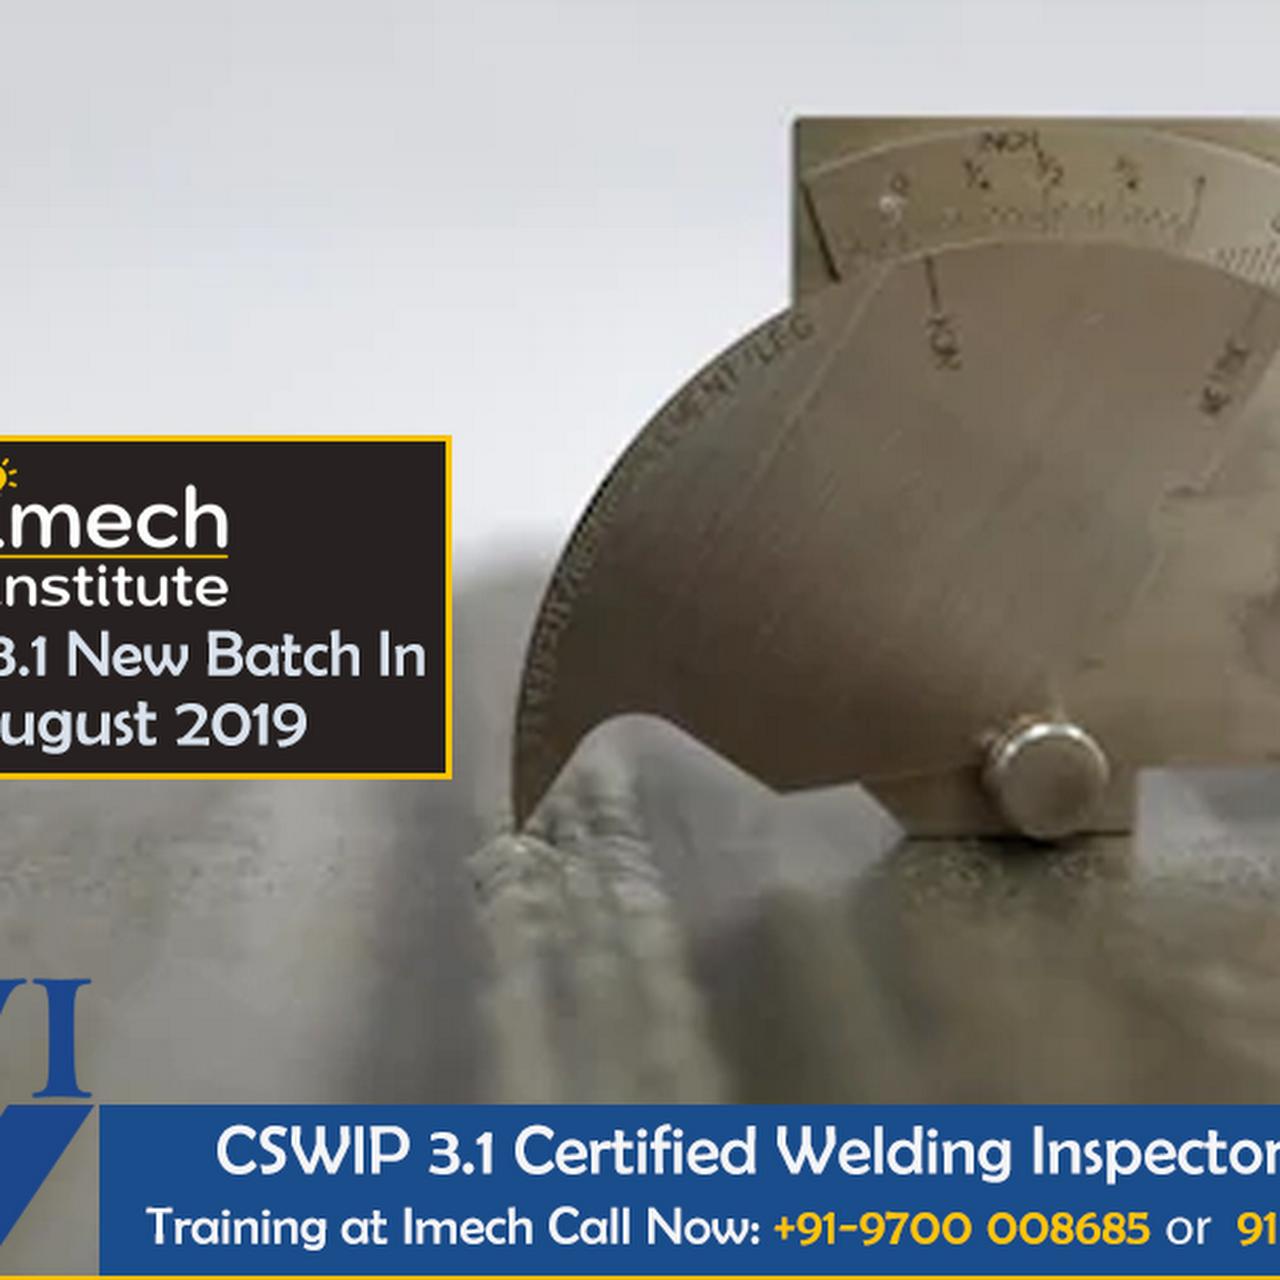 IMECH INSTITUTE PVT LTD HVAC | QA QC | NDT | MEP | SAFETY